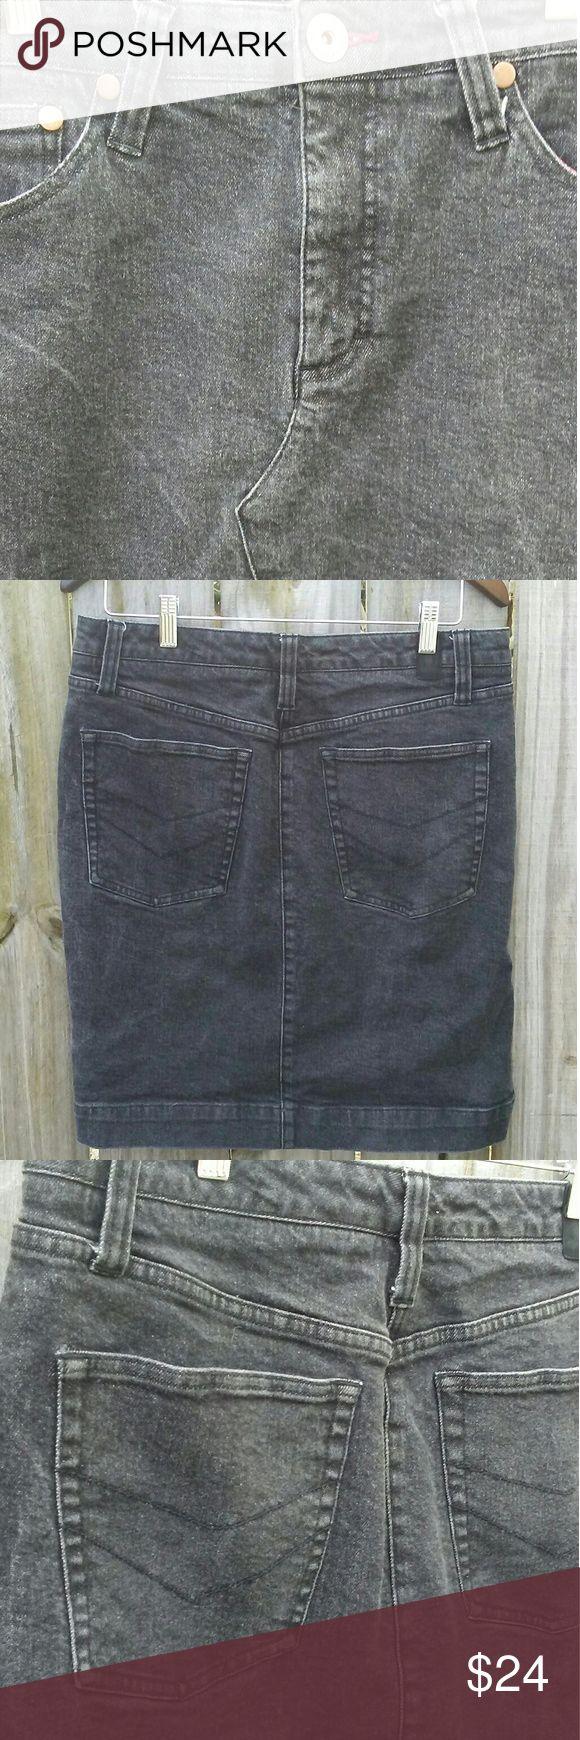 Tommy Hilfiger Retro black wash jean skirt-size 10 Tommy Hilfiger black acid wash jean skirt Black acid wash Length 20.5 inches Waist 32 Tommy Hilfiger Skirts Pencil